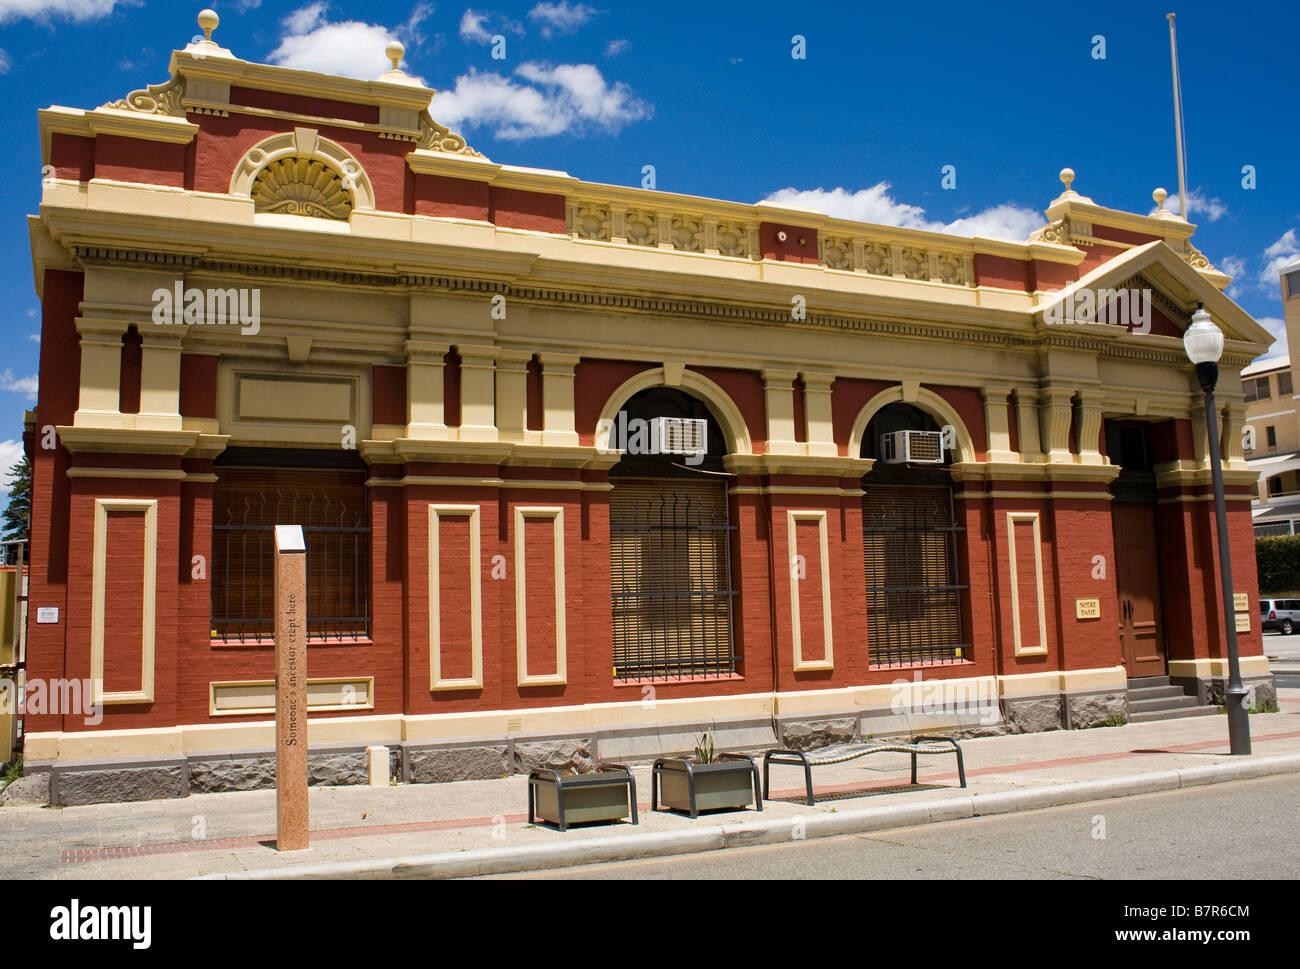 The Art School Fremantle Perth Western Australia - Stock Image